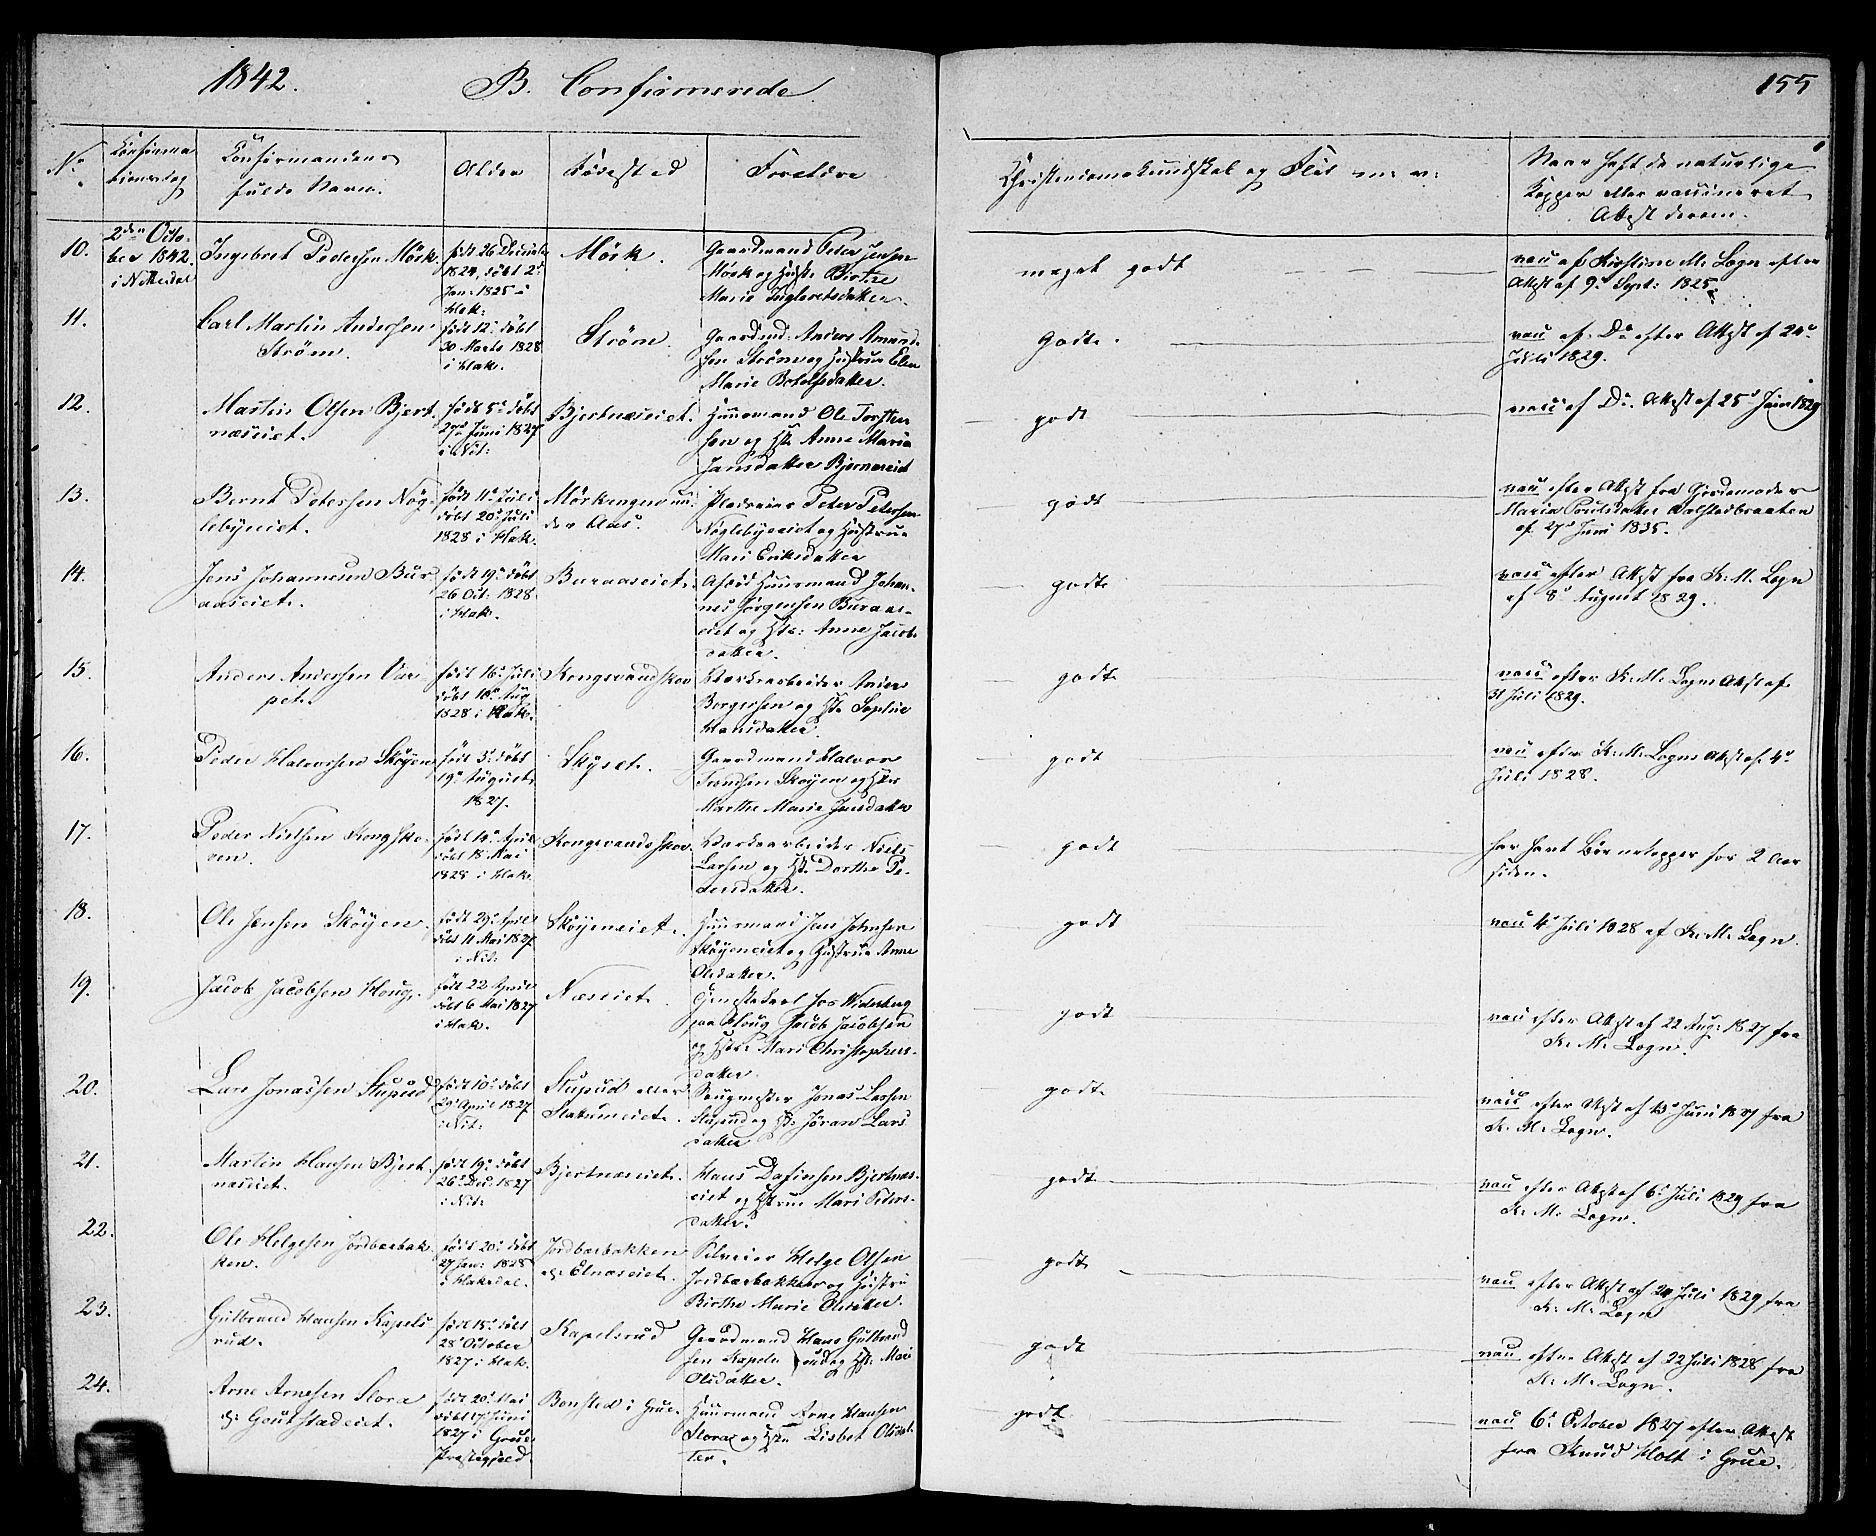 SAO, Nittedal prestekontor Kirkebøker, F/Fa/L0004: Ministerialbok nr. I 4, 1836-1849, s. 155